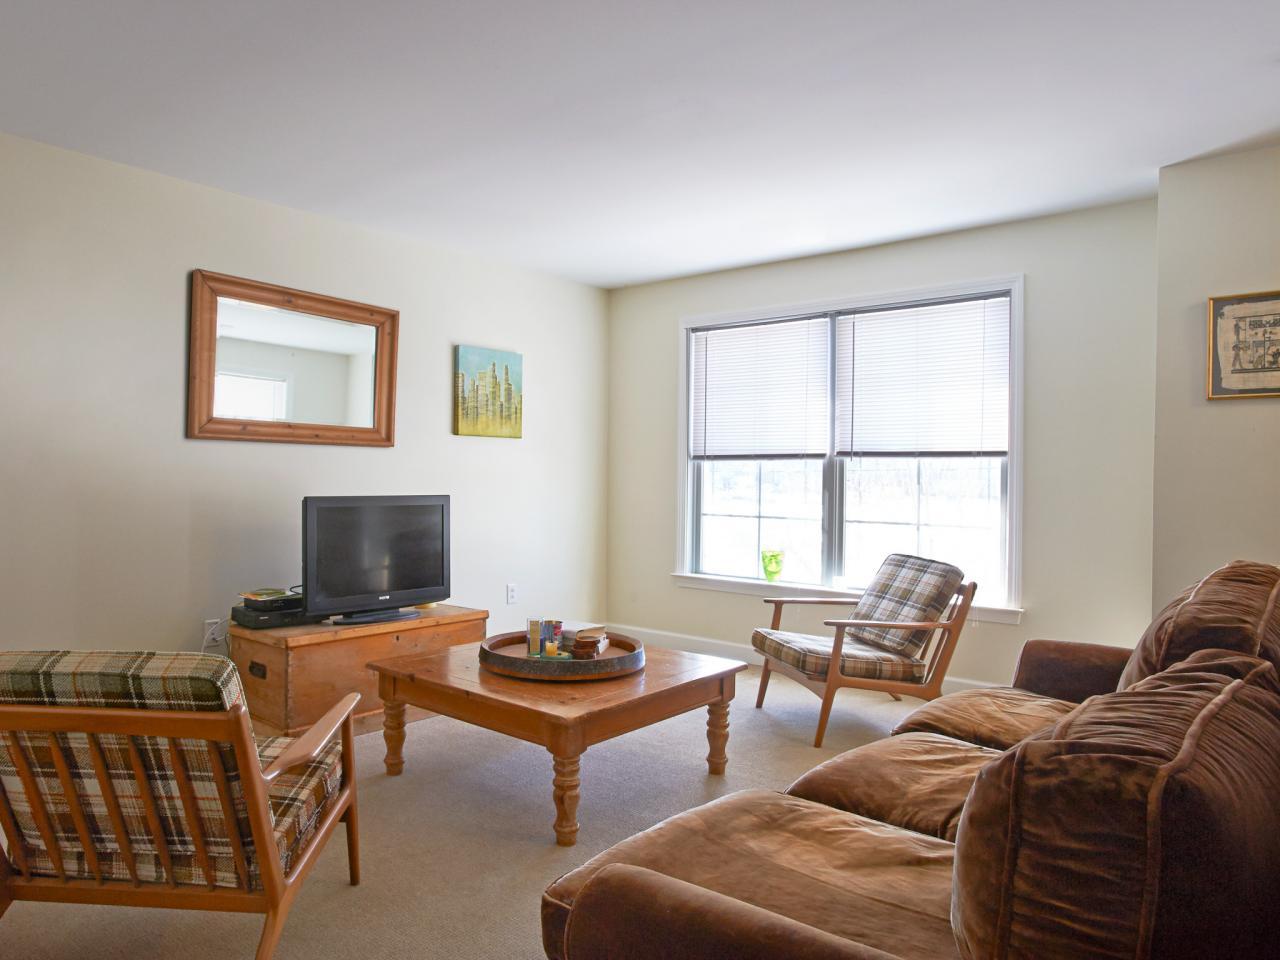 A Bare Bones Living Room Gets Vibrant Update